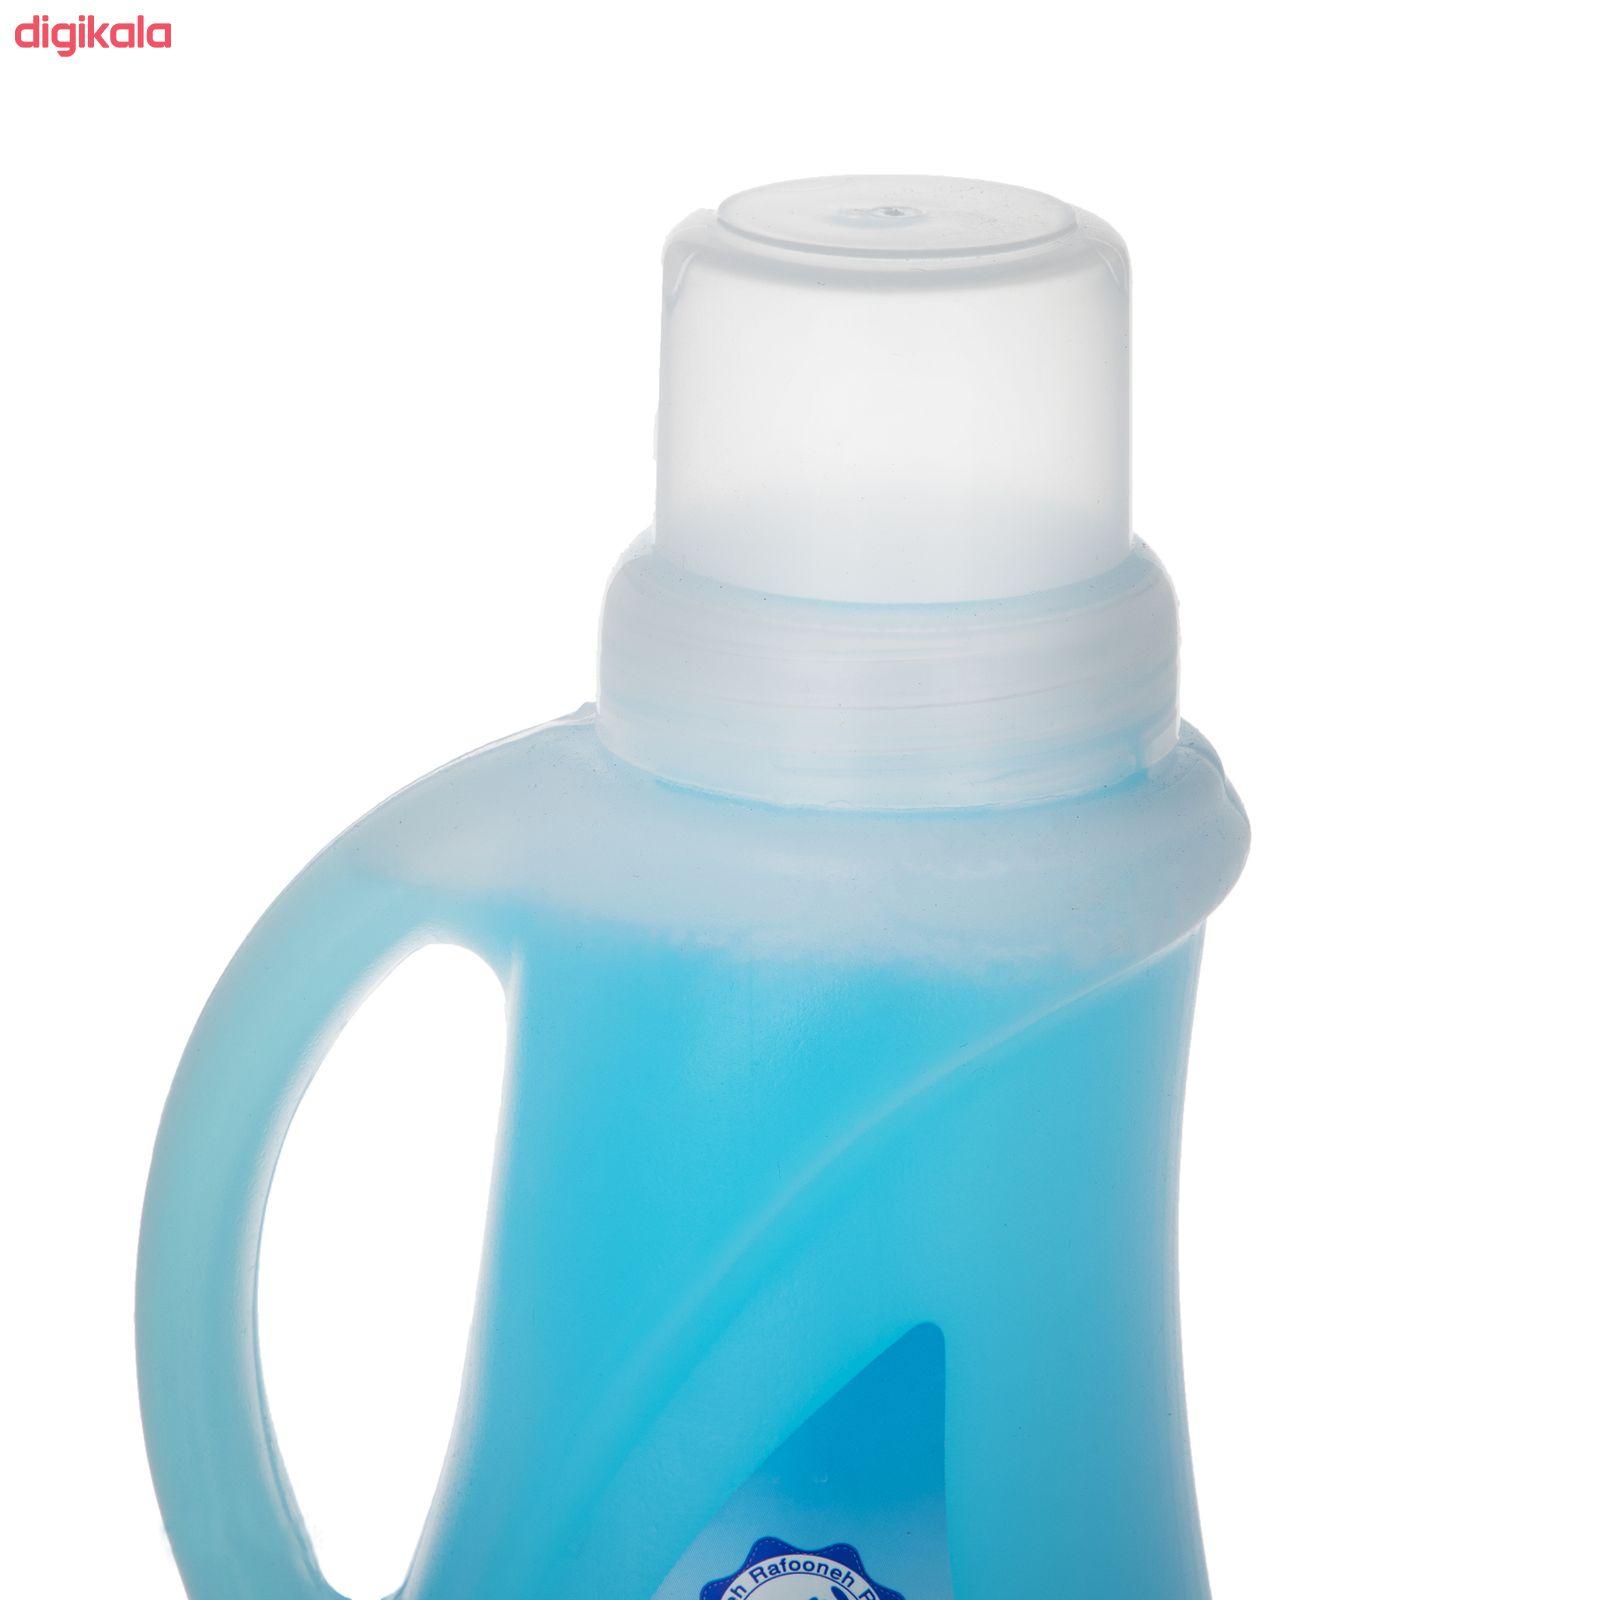 مایع لباسشویی رافونه کد 100 وزن 1 کیلوگرم main 1 3